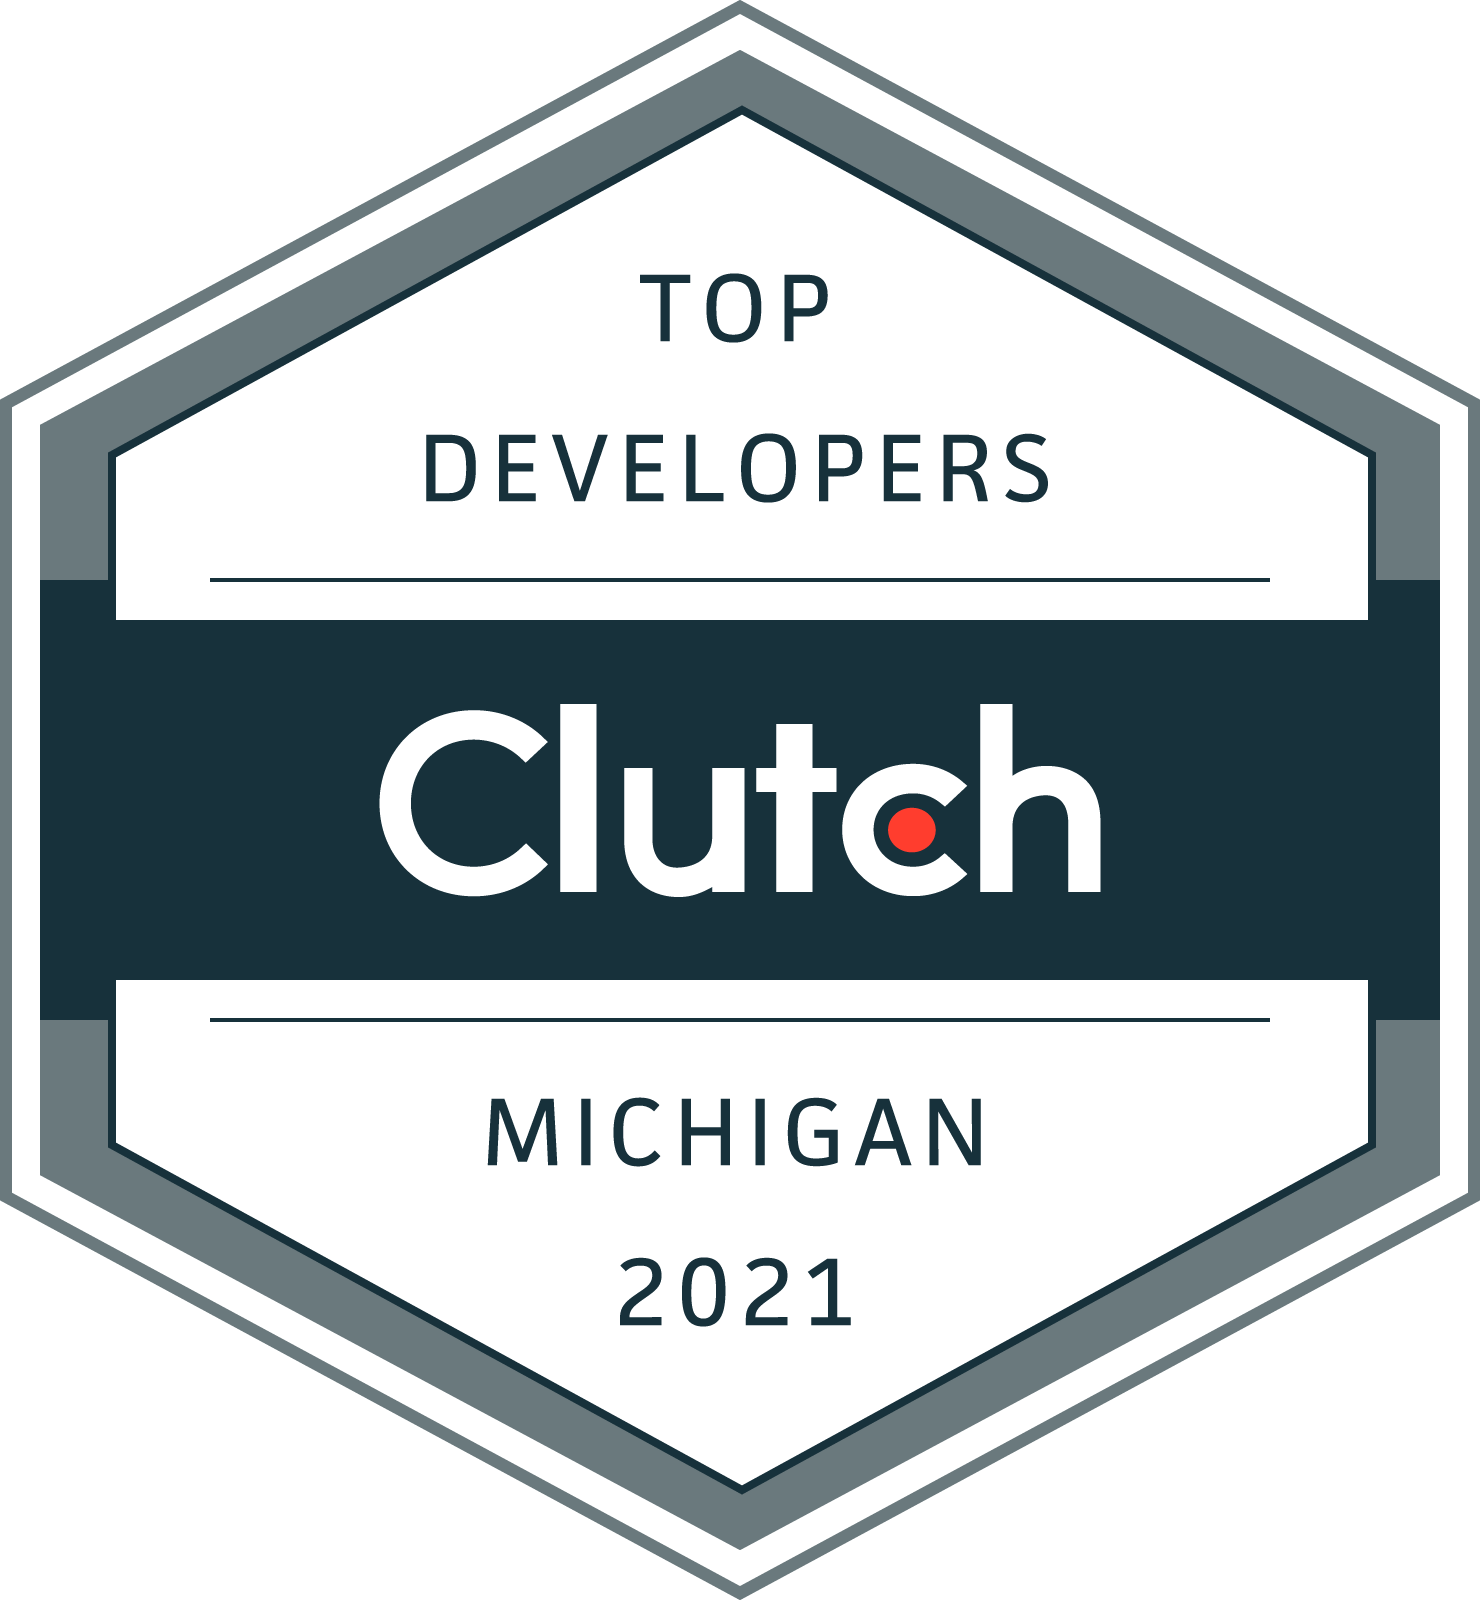 Top Web Developer by Clutch 2021